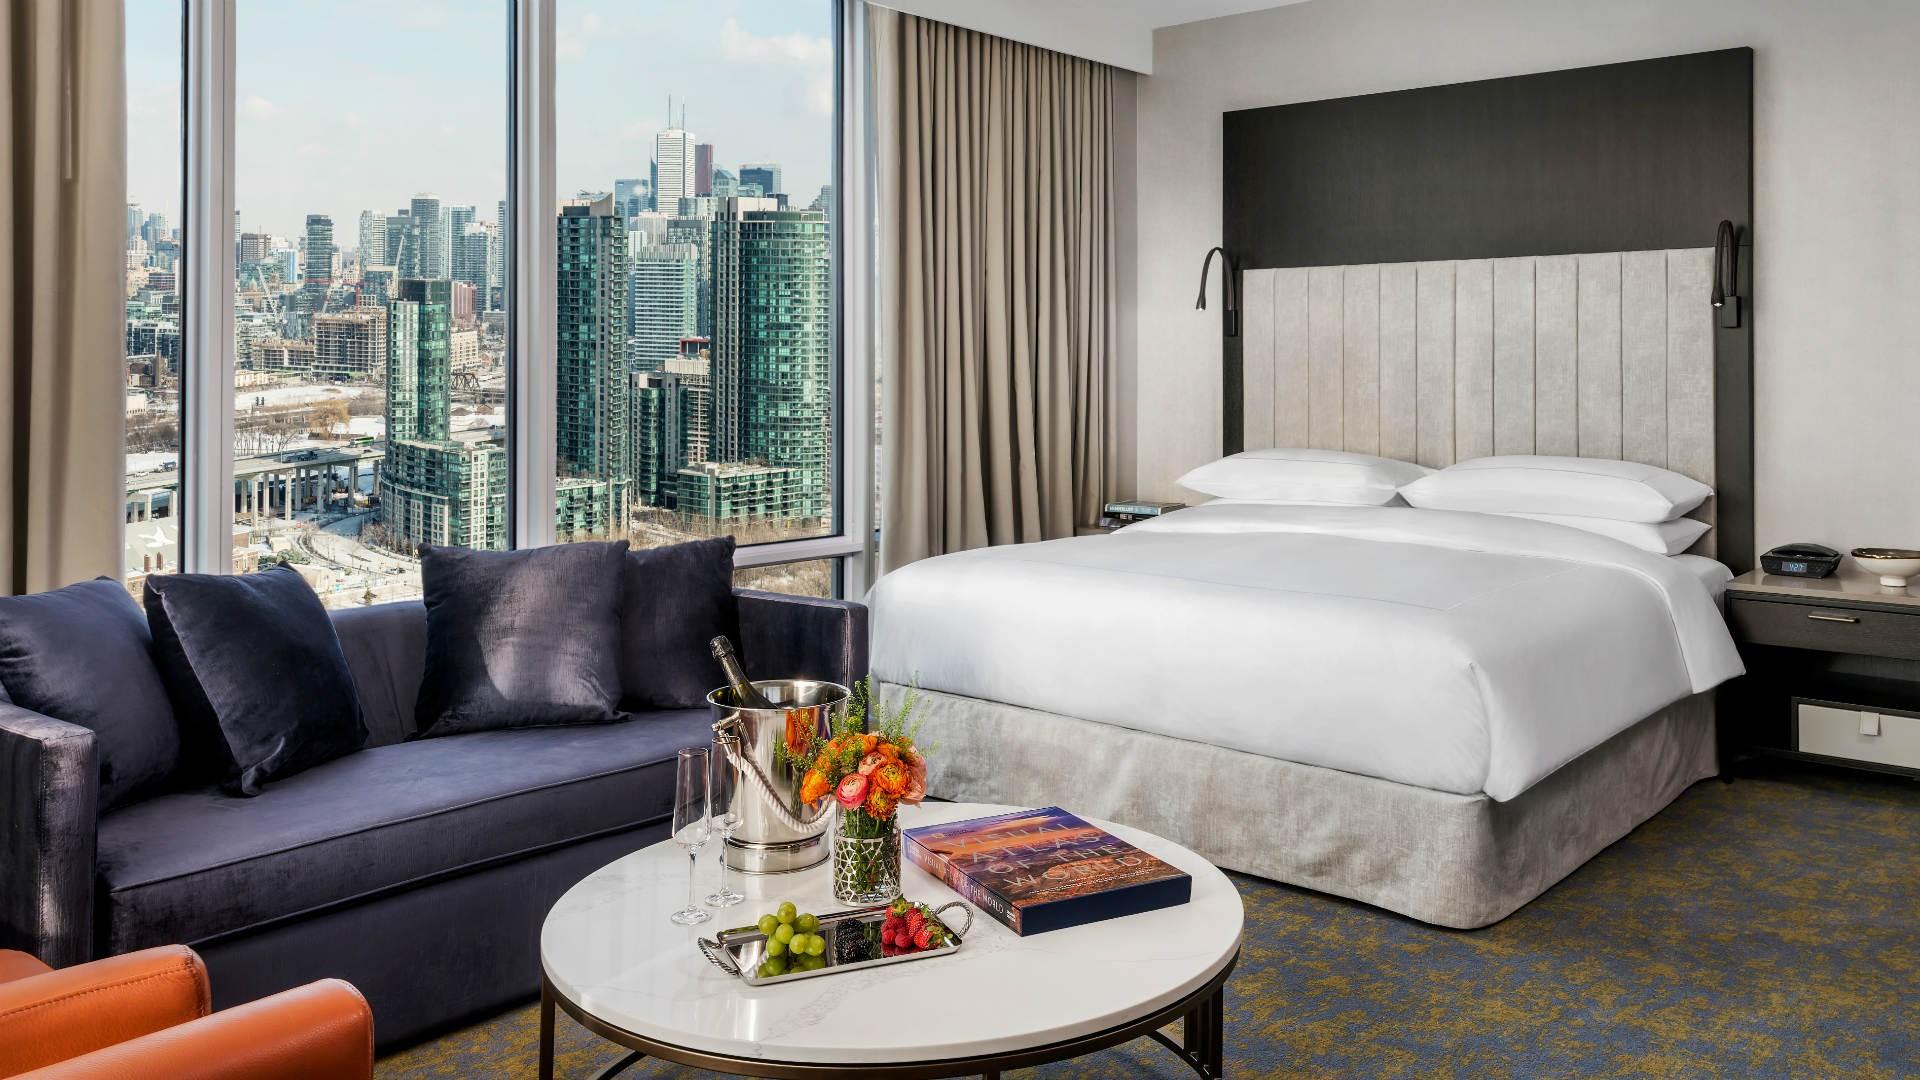 Hotel X Toronto Review: a room